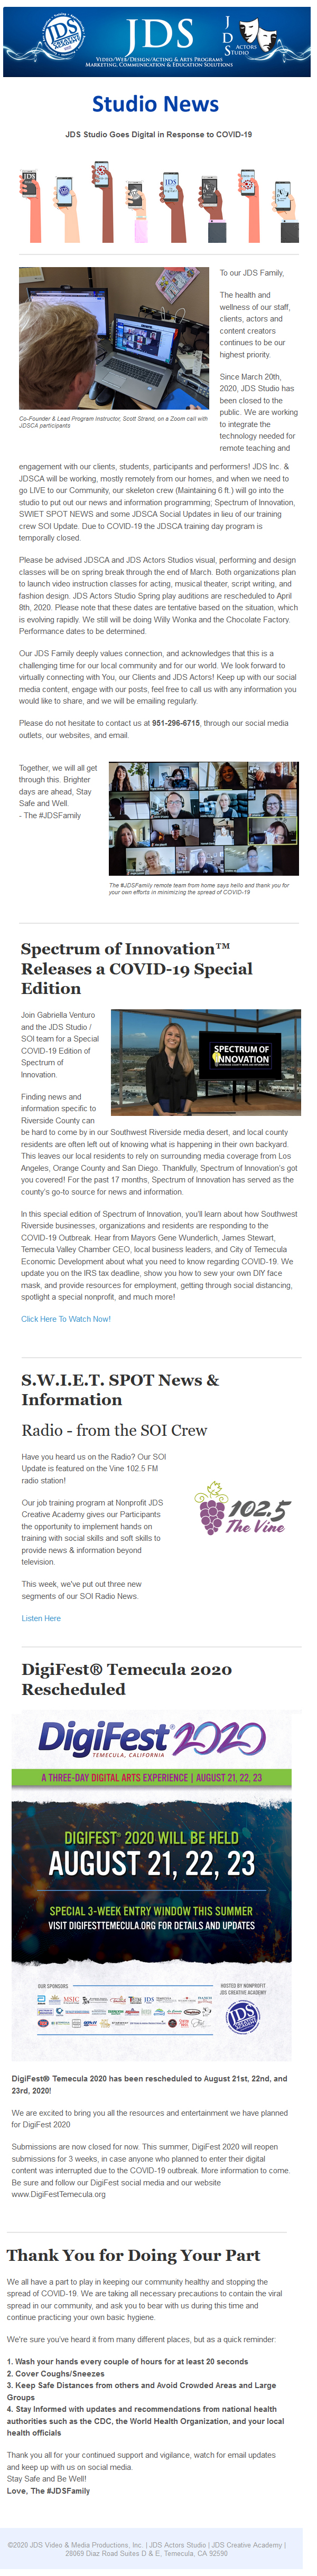 JDS Studio News March